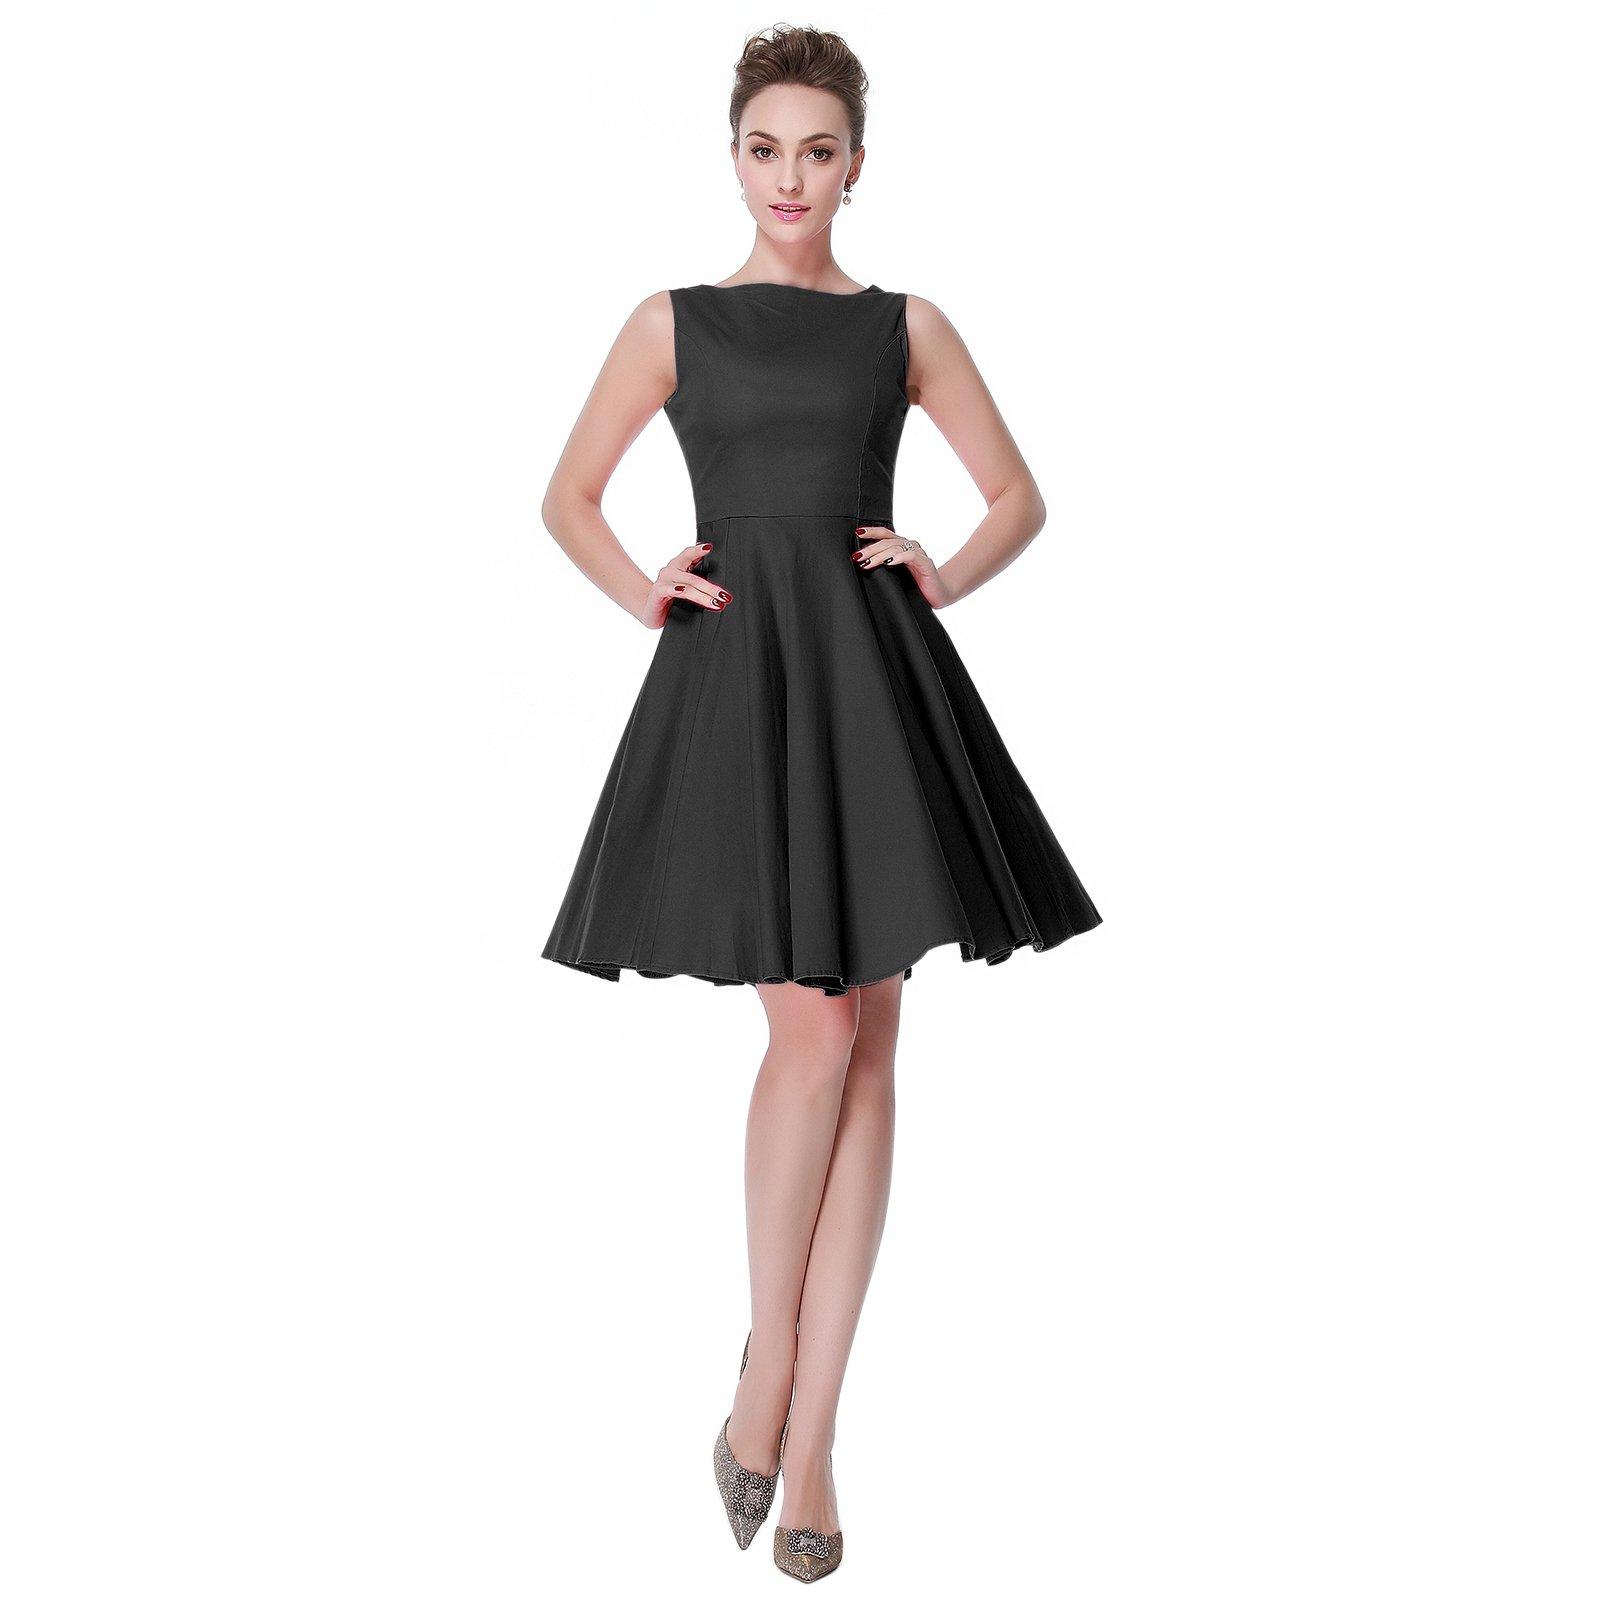 Heroecol Vintage 1950s 50s Dress Hepburn Style Retro Rockabiily Cocktail L BK